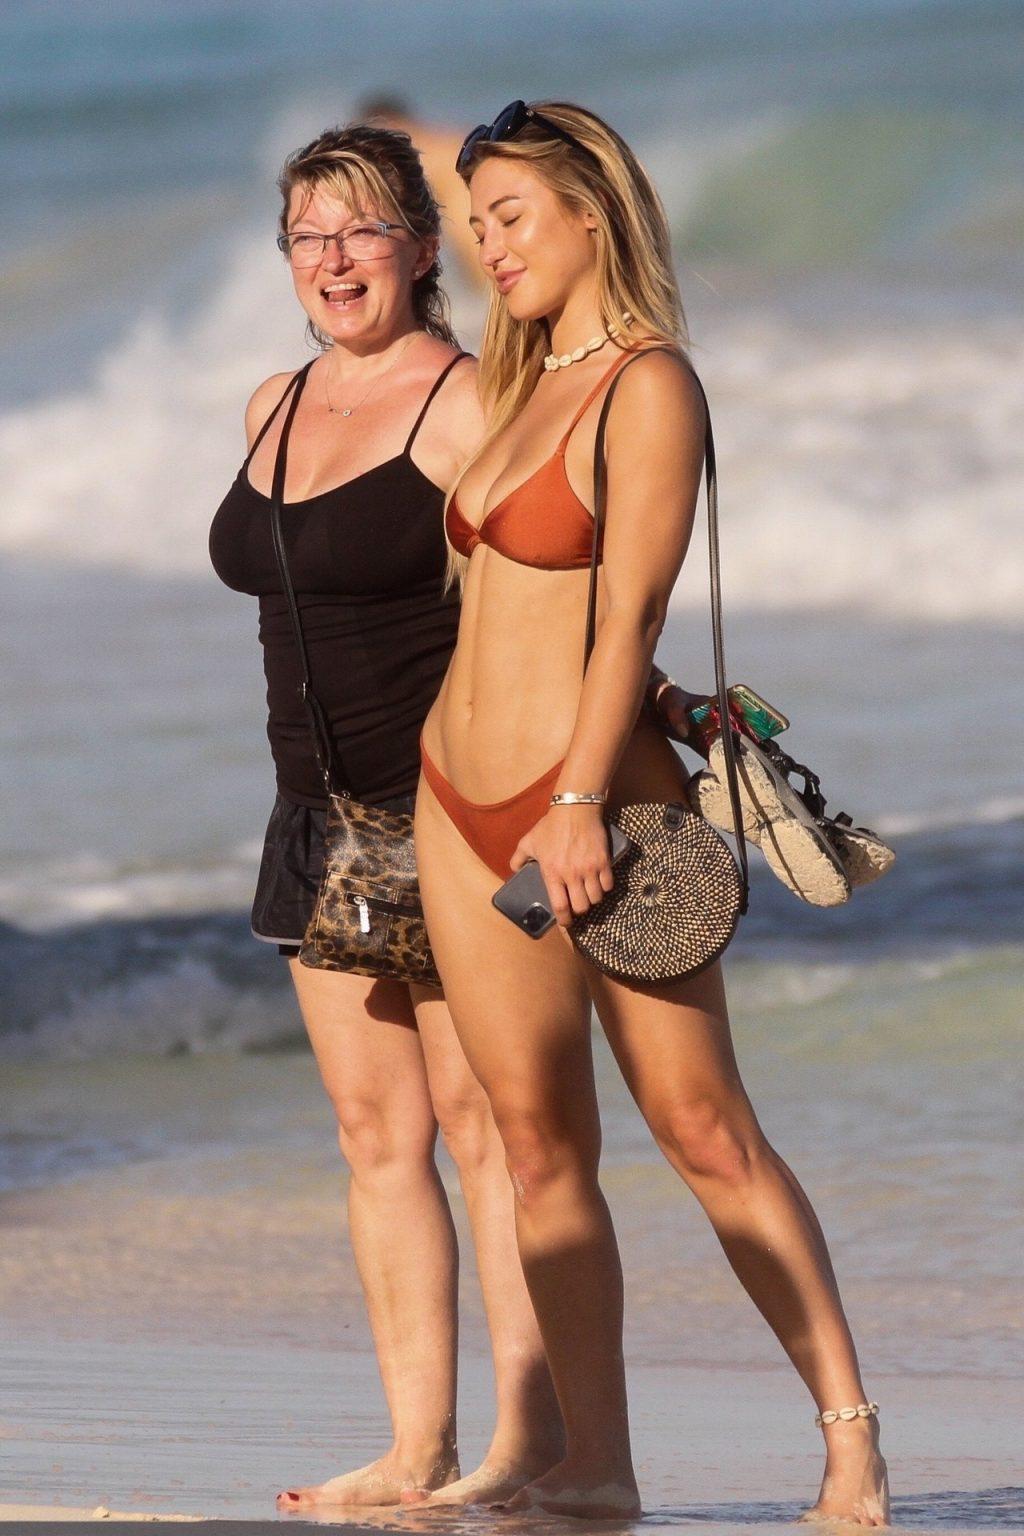 Stefanie Knight Bikini